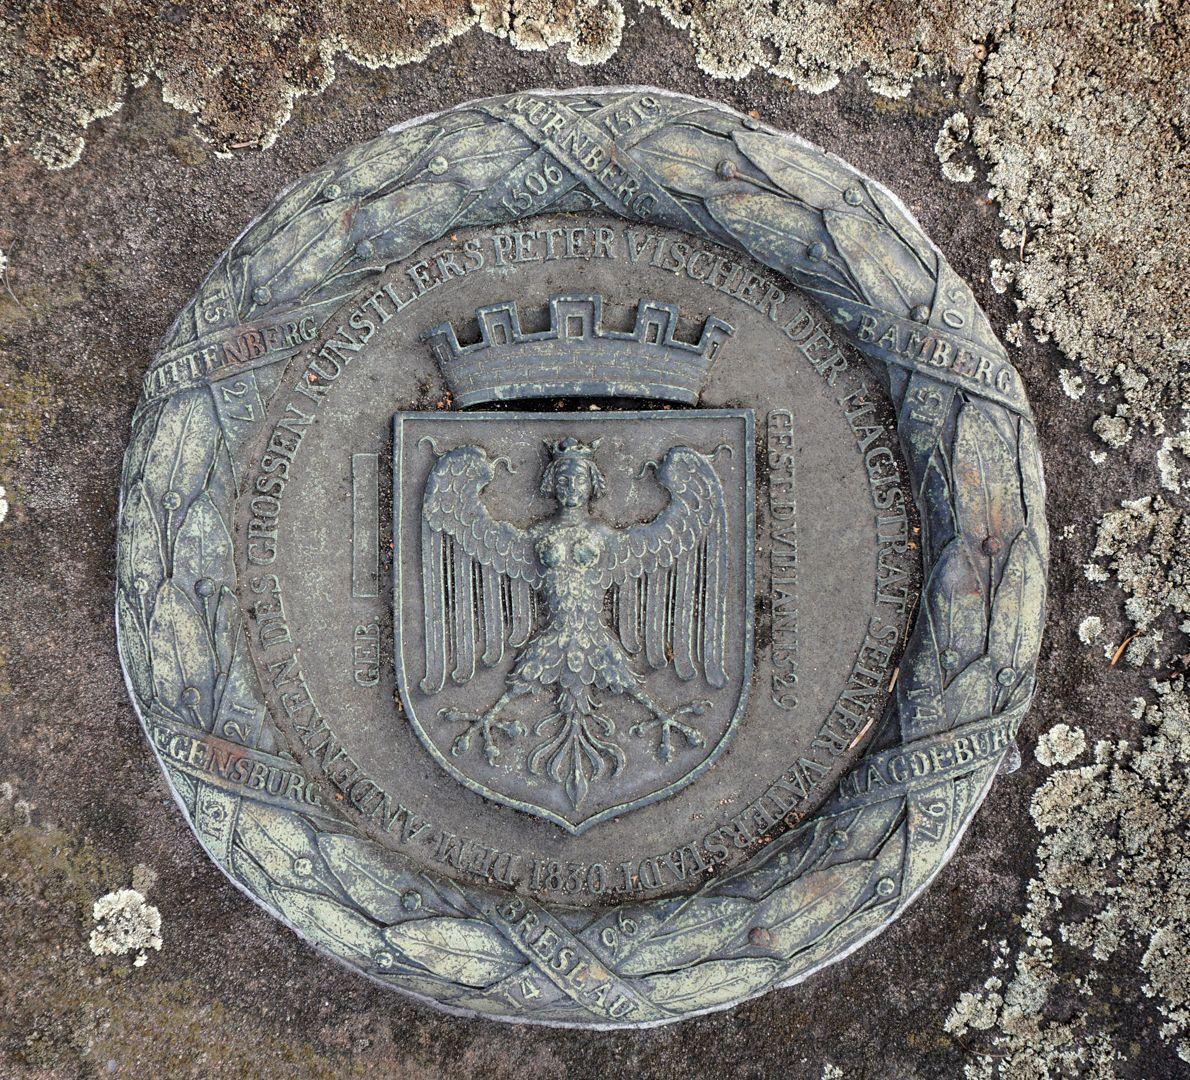 Peter Vischer Grabstätte DEM ANDENKEN DES GROSSEN KÜNSTLERS PETER VISCHER DER MAGISTRAT SEINER VATERSTADT 1830